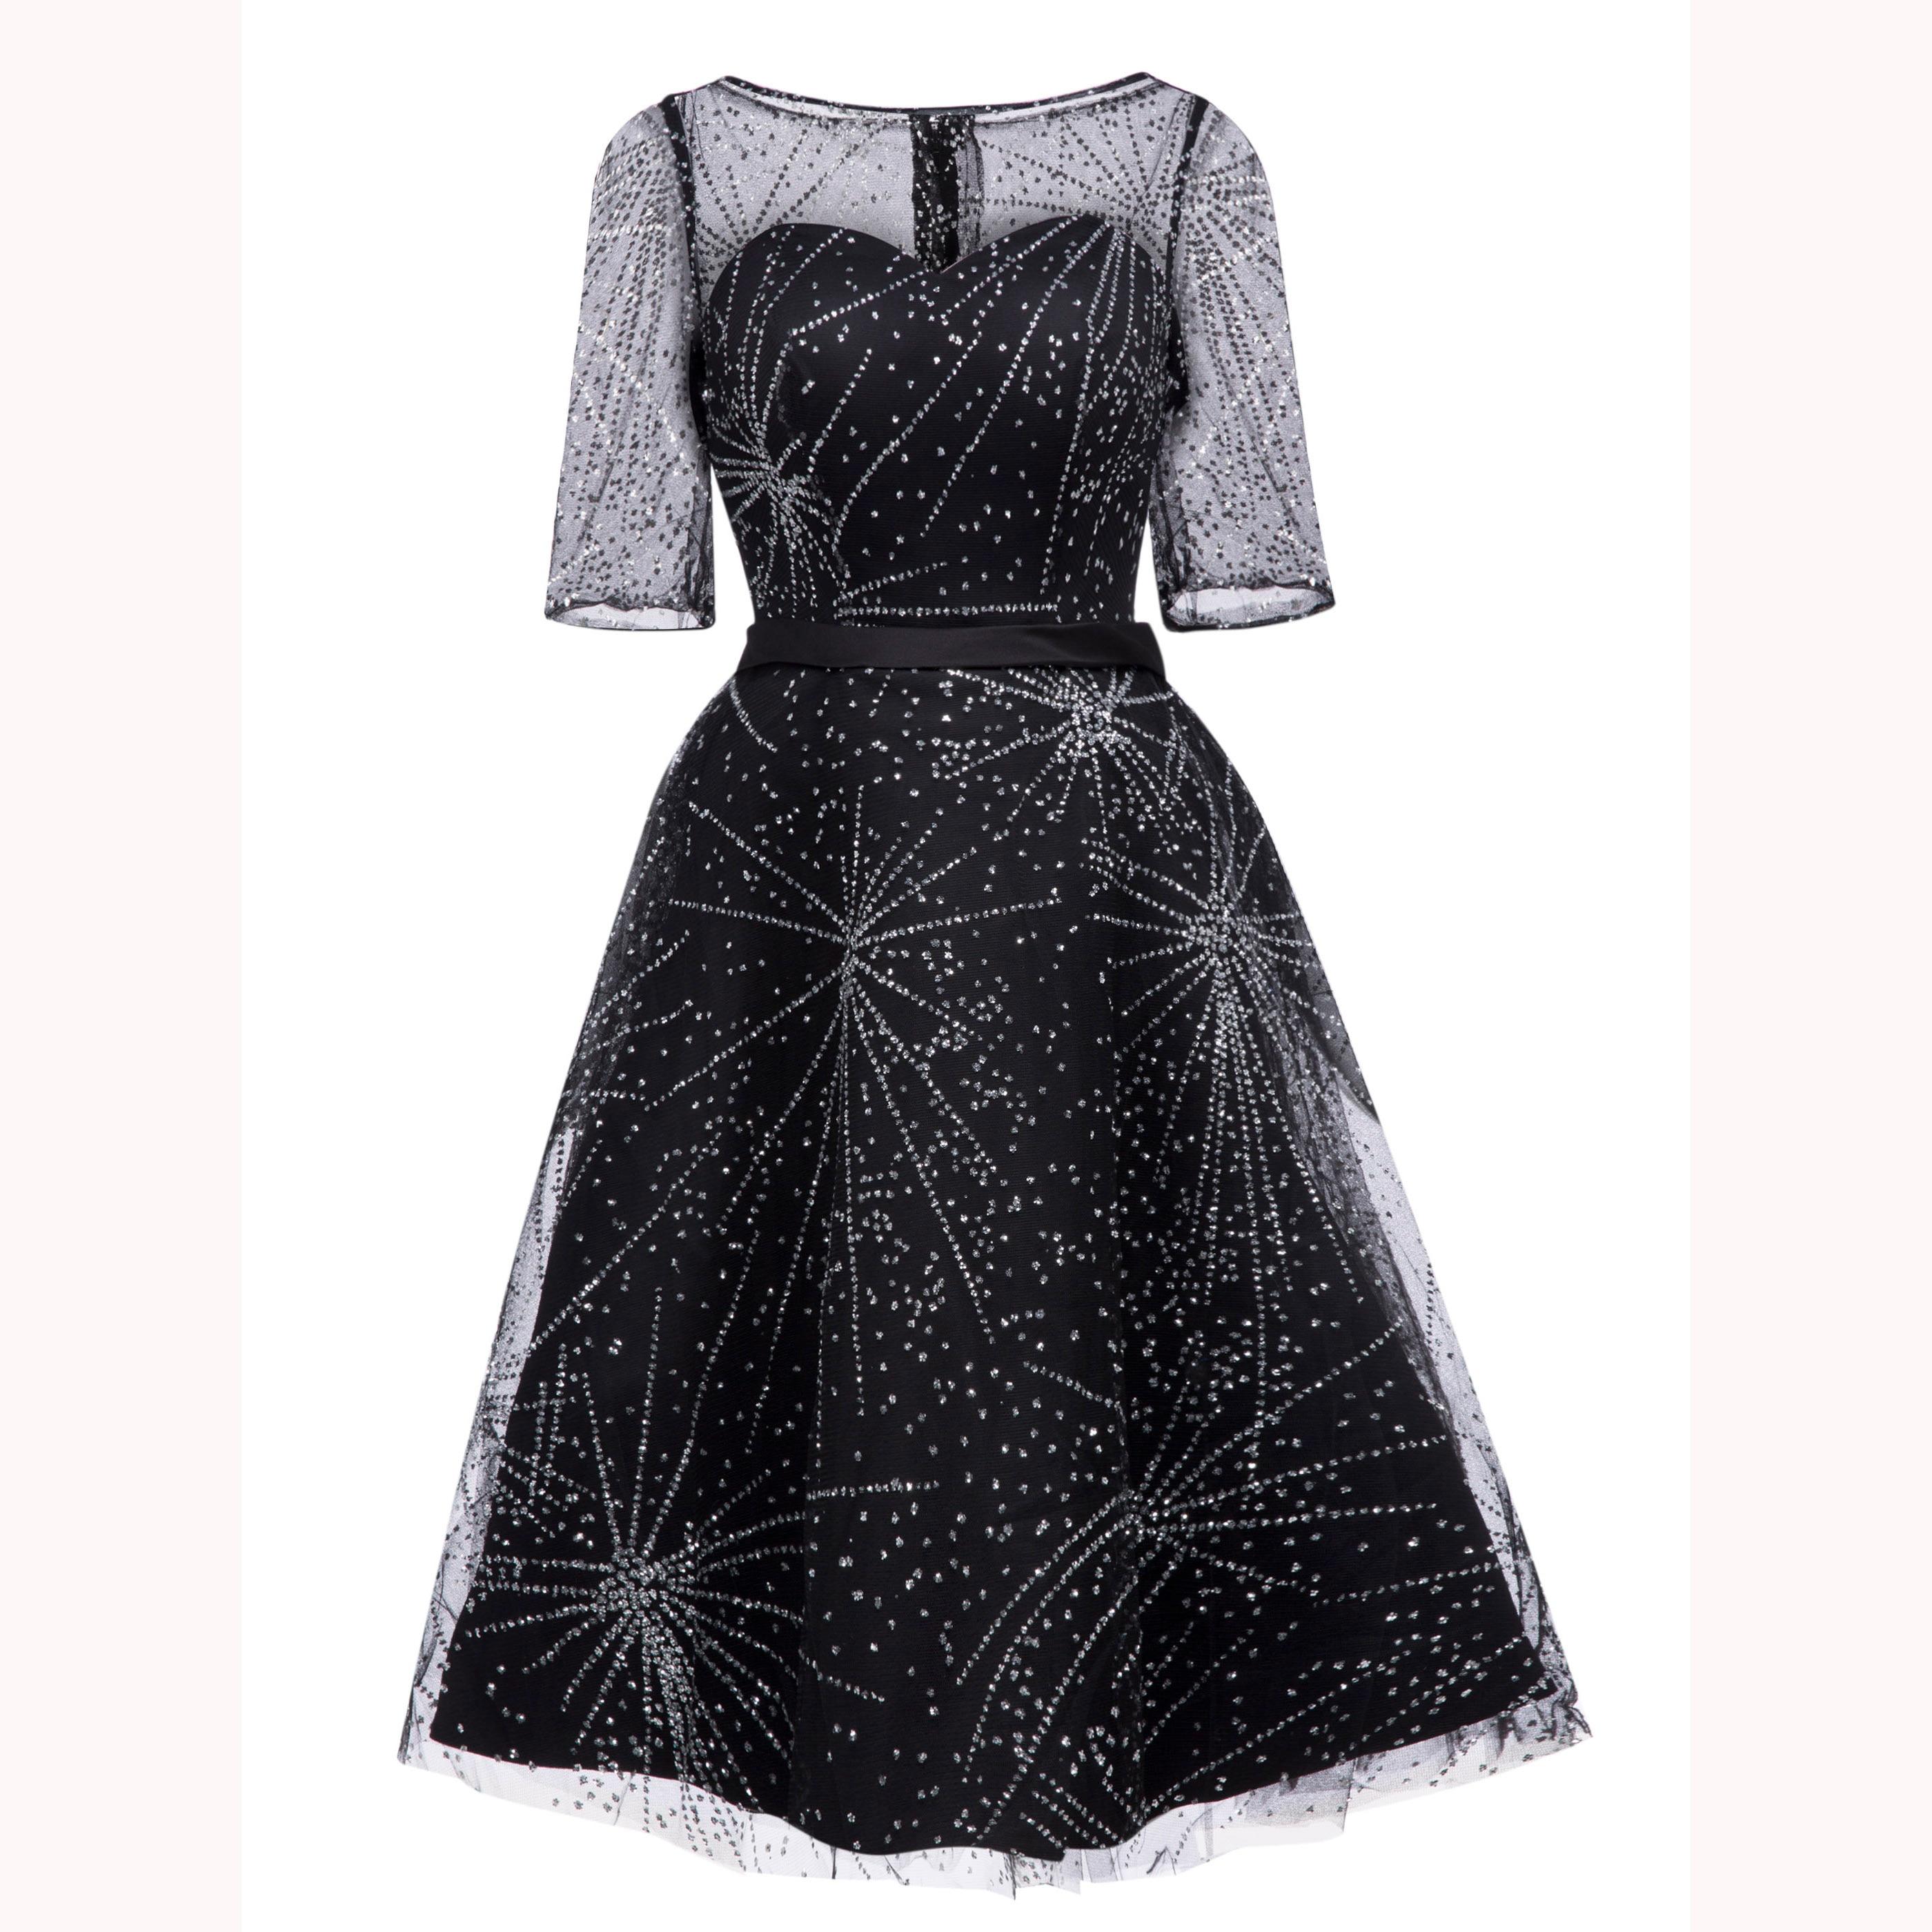 Dressv Elegant Cocktail Dress Black Scoop Neck Half Sleeves Knee Length A Line Gown Lady Homecoming Short Cocktail Dresses